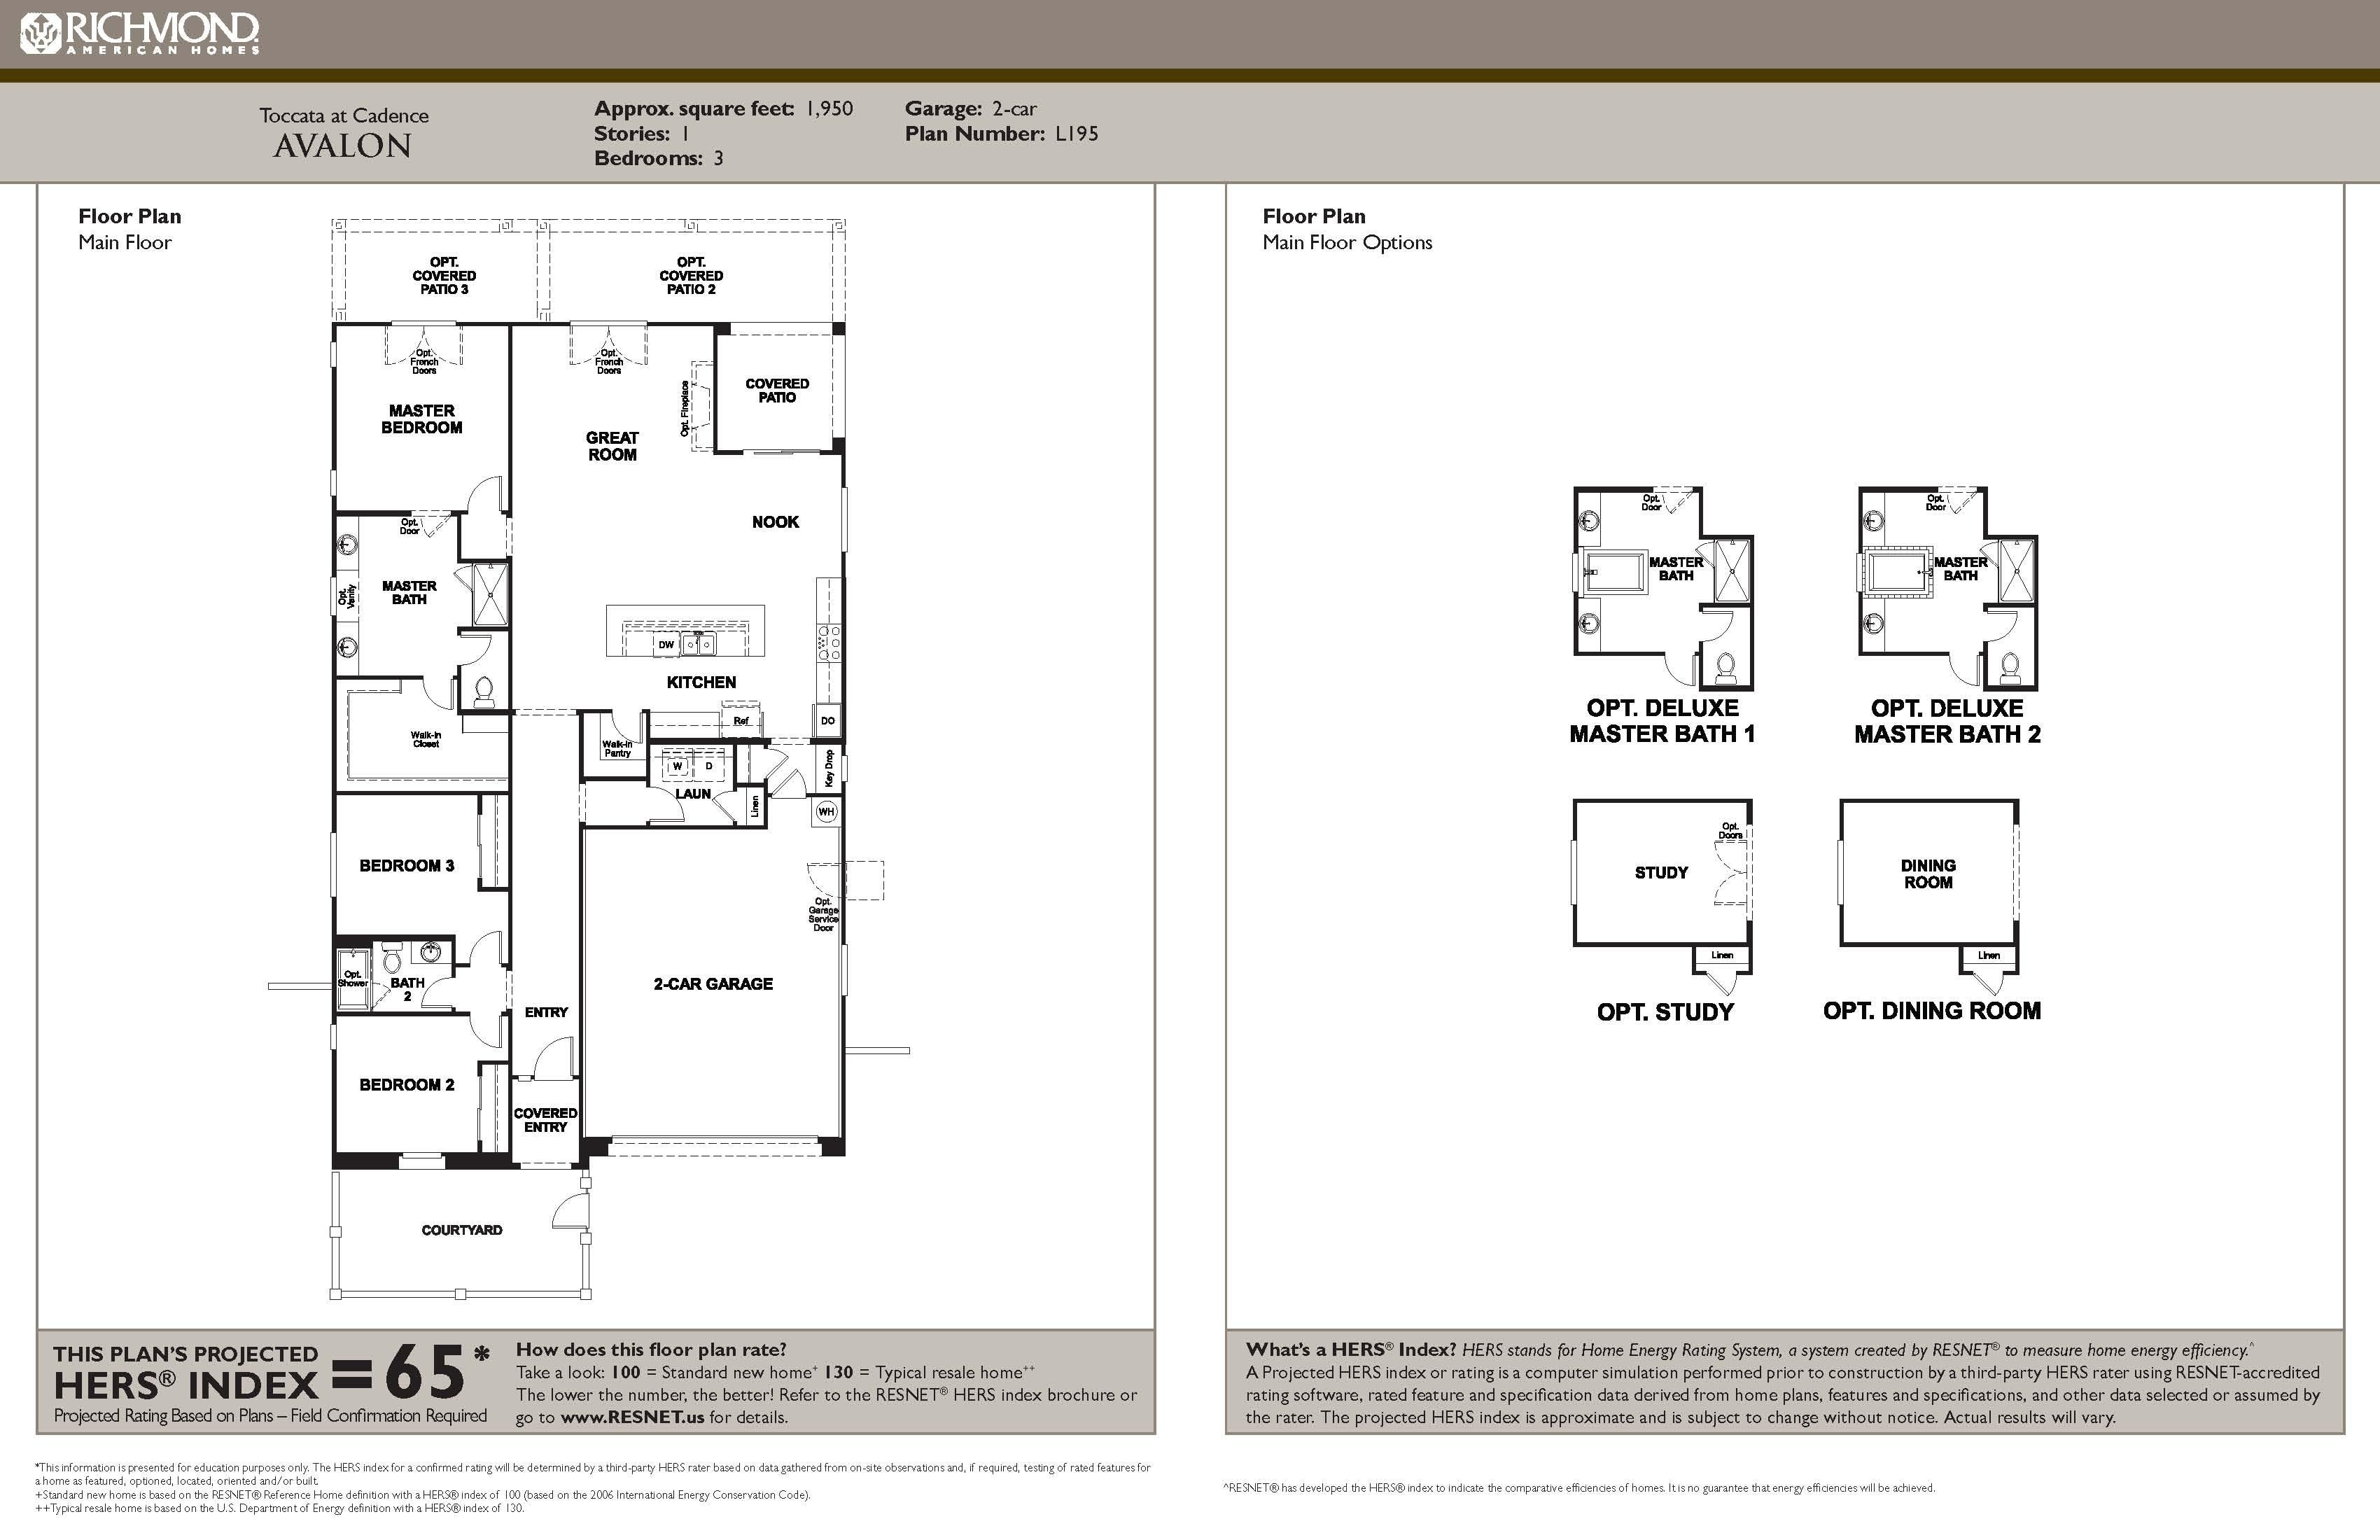 Floorplan for Avalon